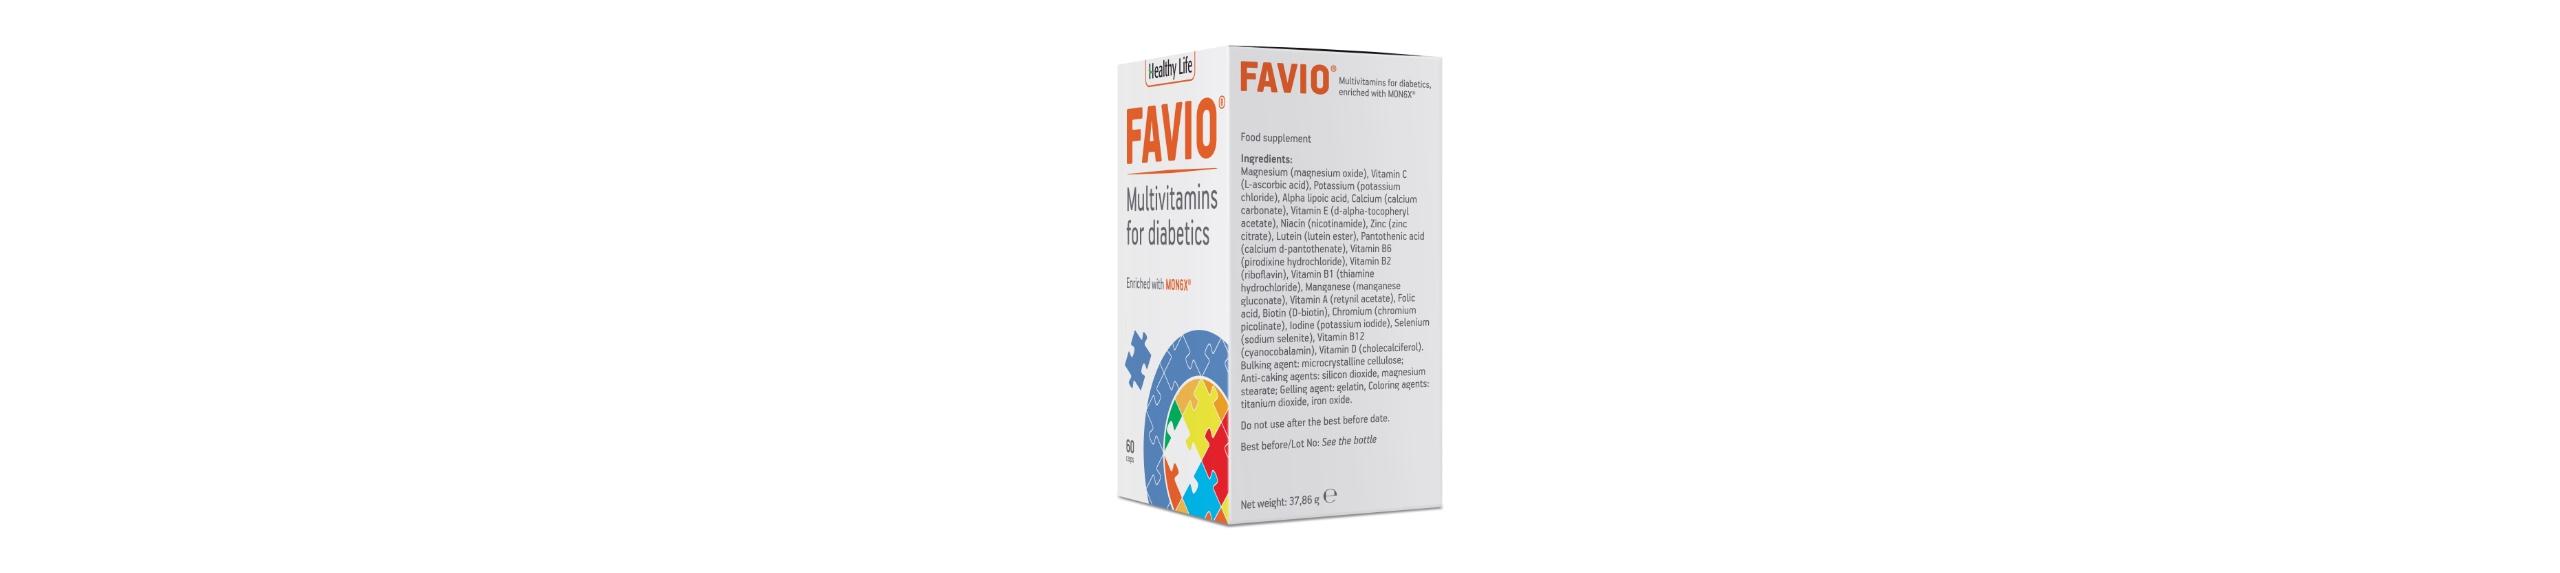 P3-Slider-img-Favio3